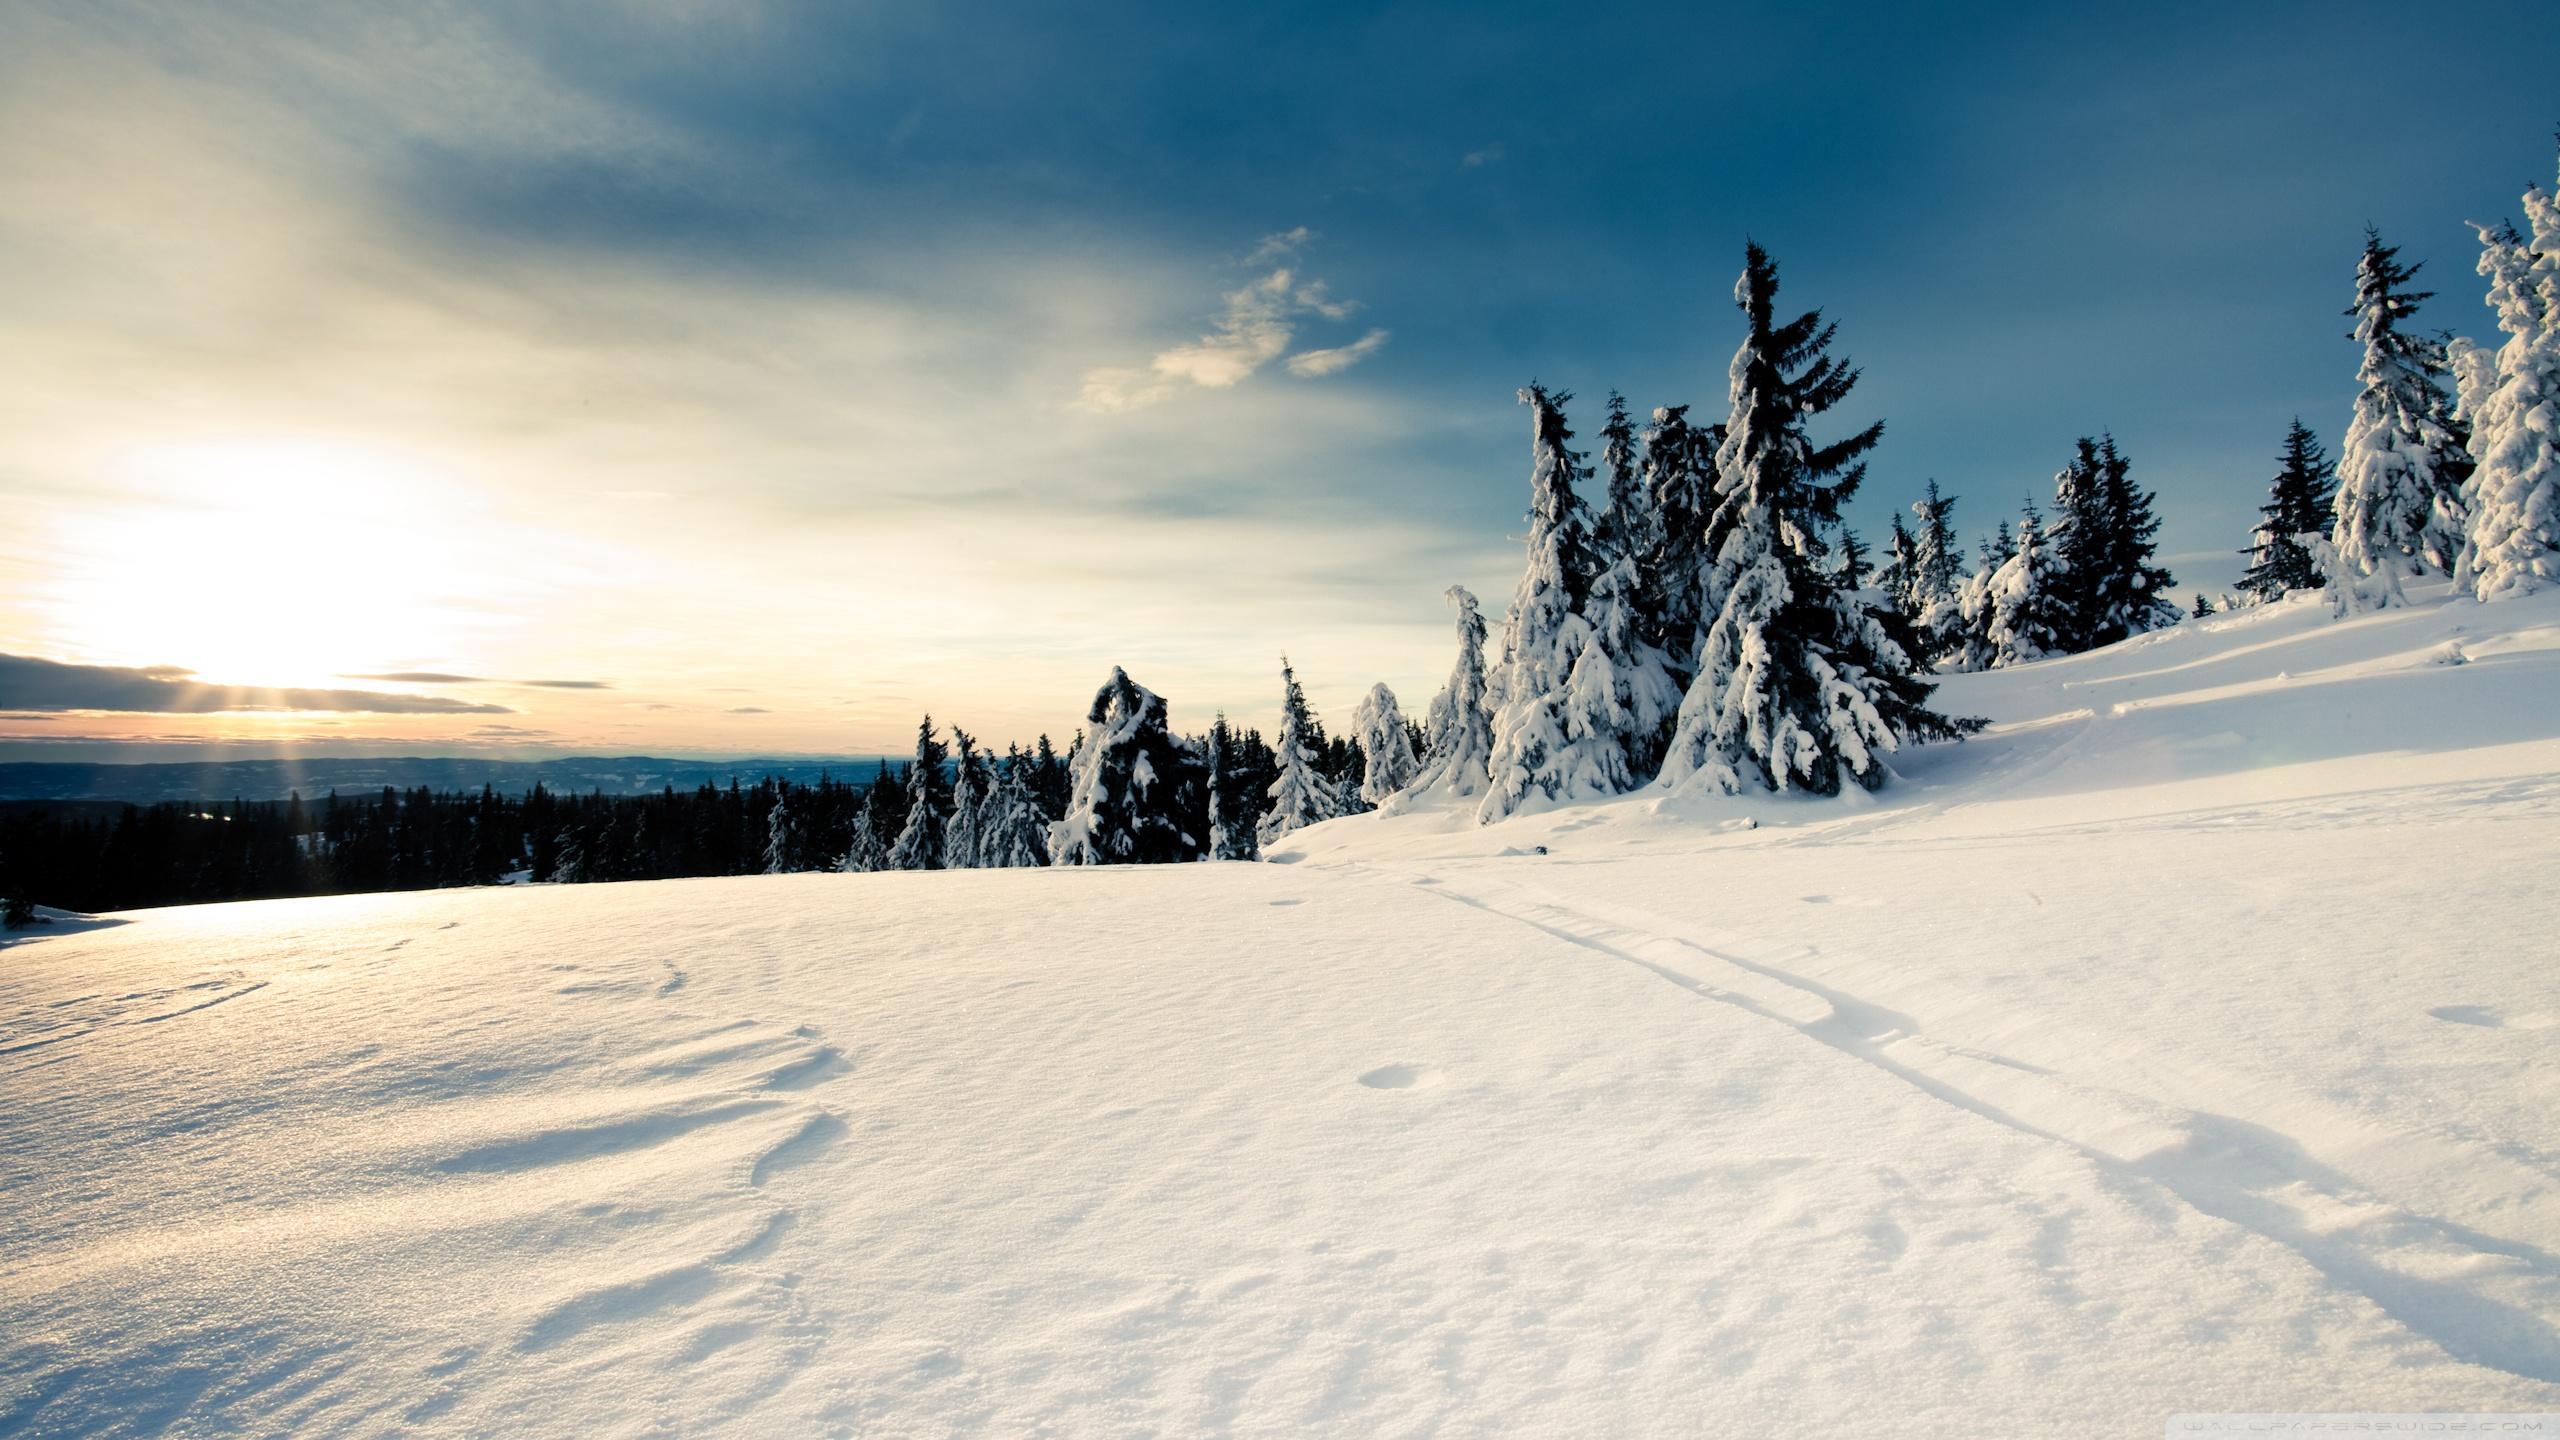 snow-sun-sunlight-winter-trees-forest-hd-2K-wallpaper